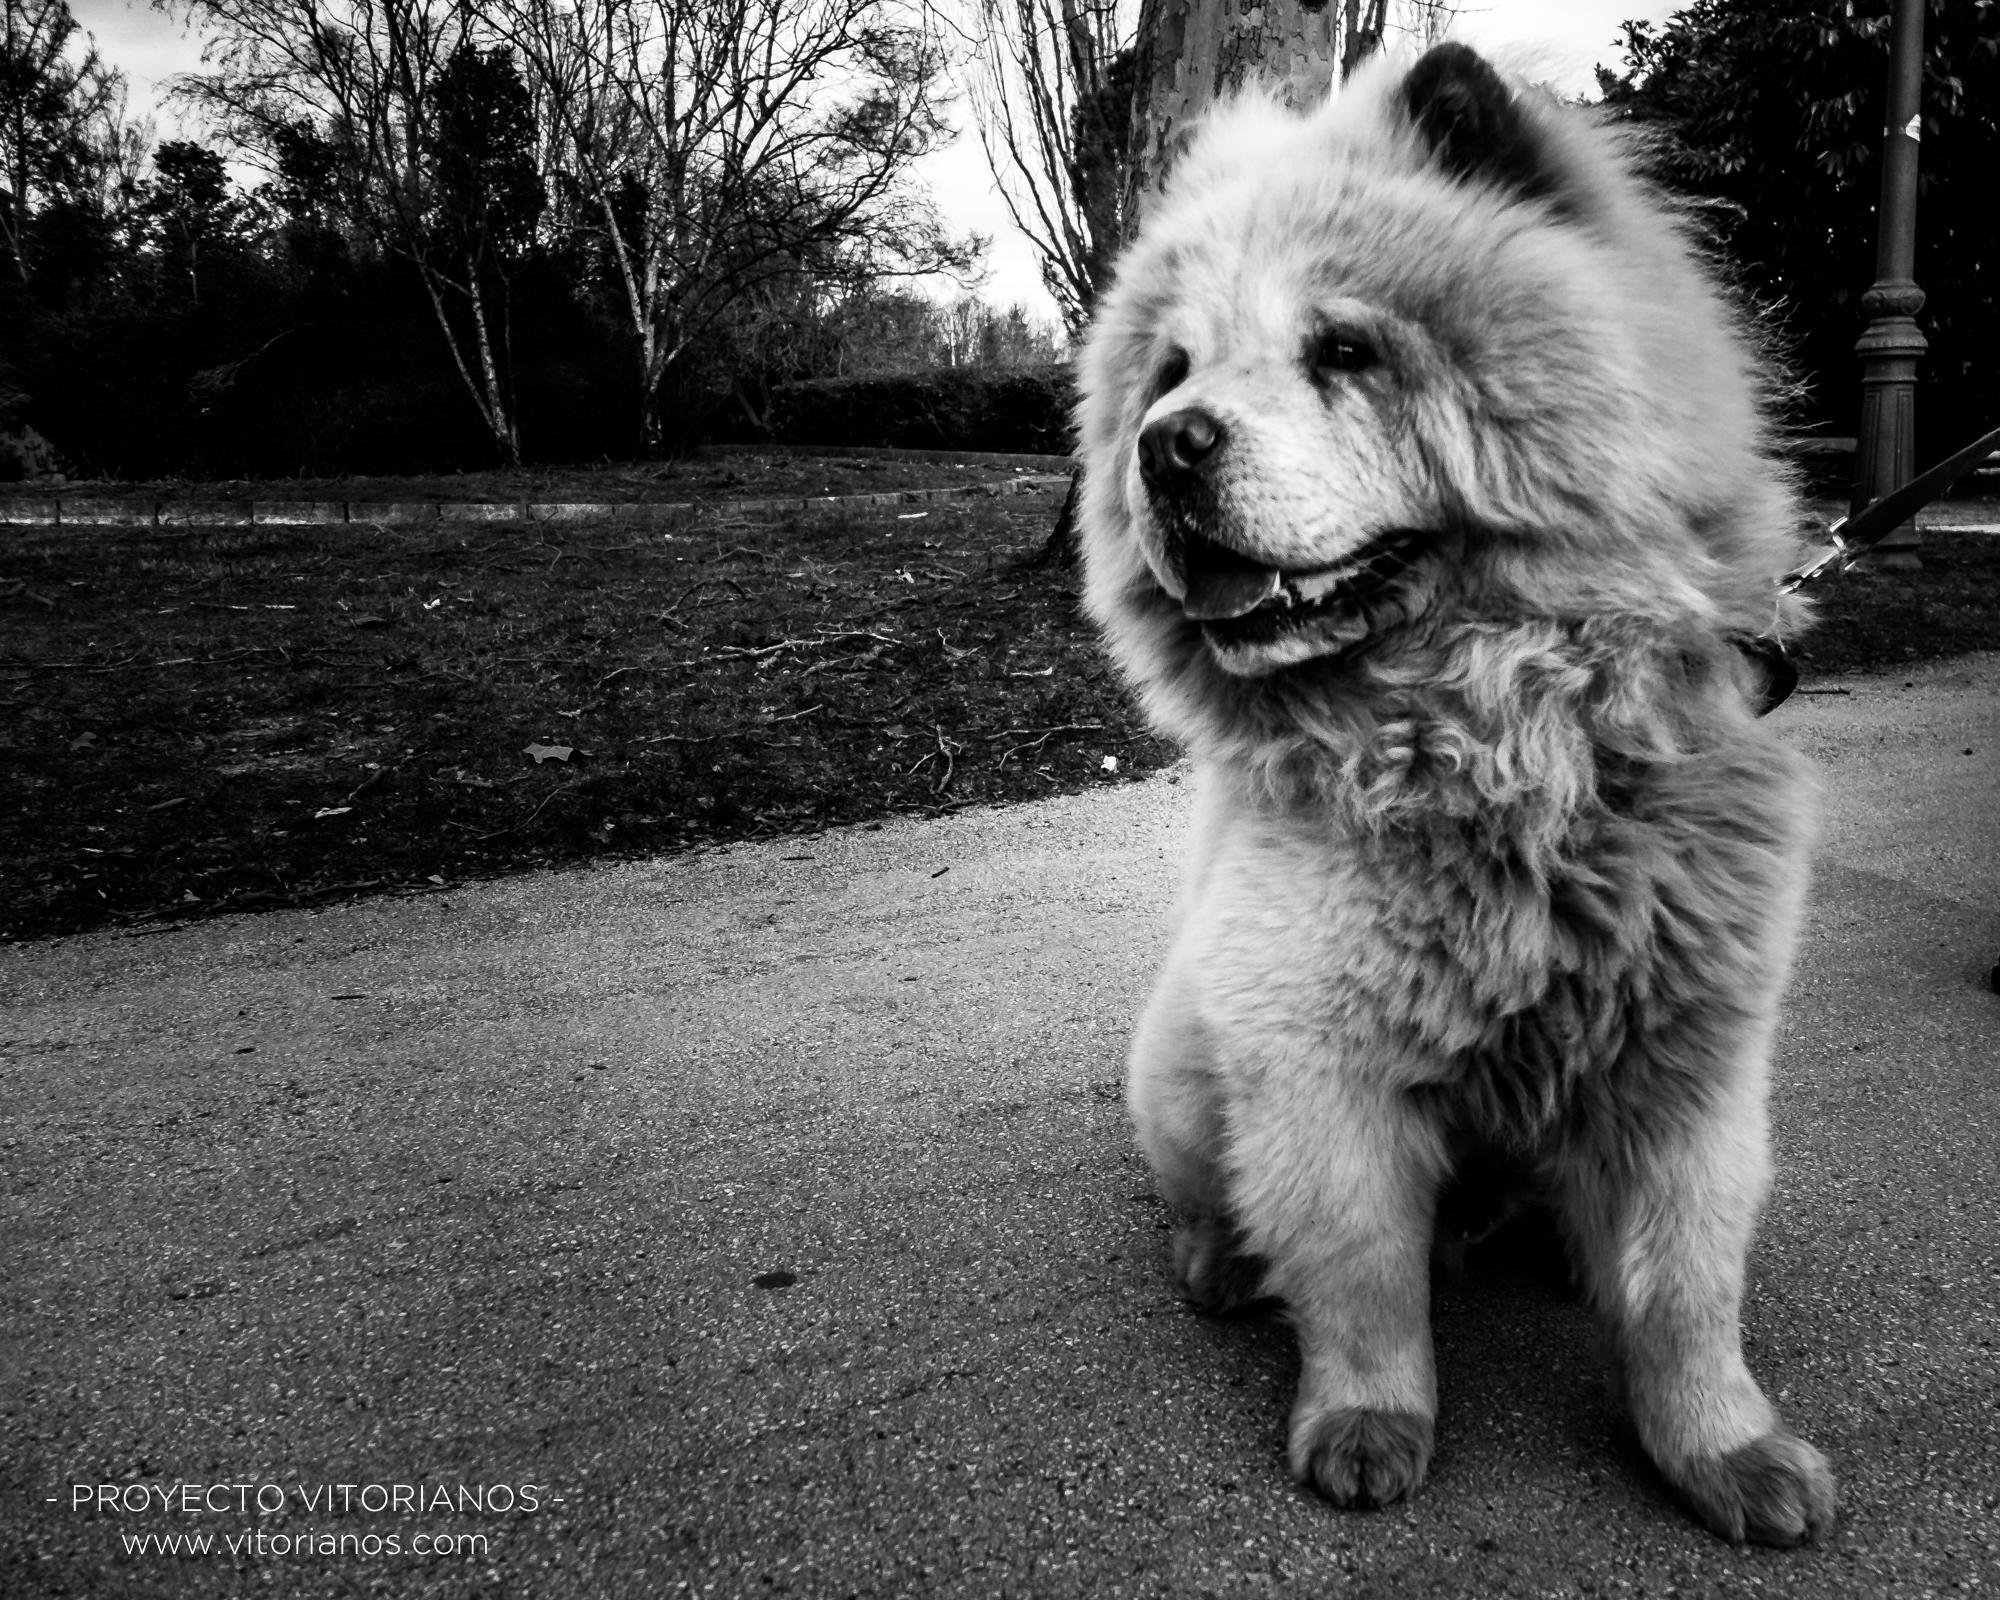 Perro vitoriano - Foto: Sara Ruiz de Austri